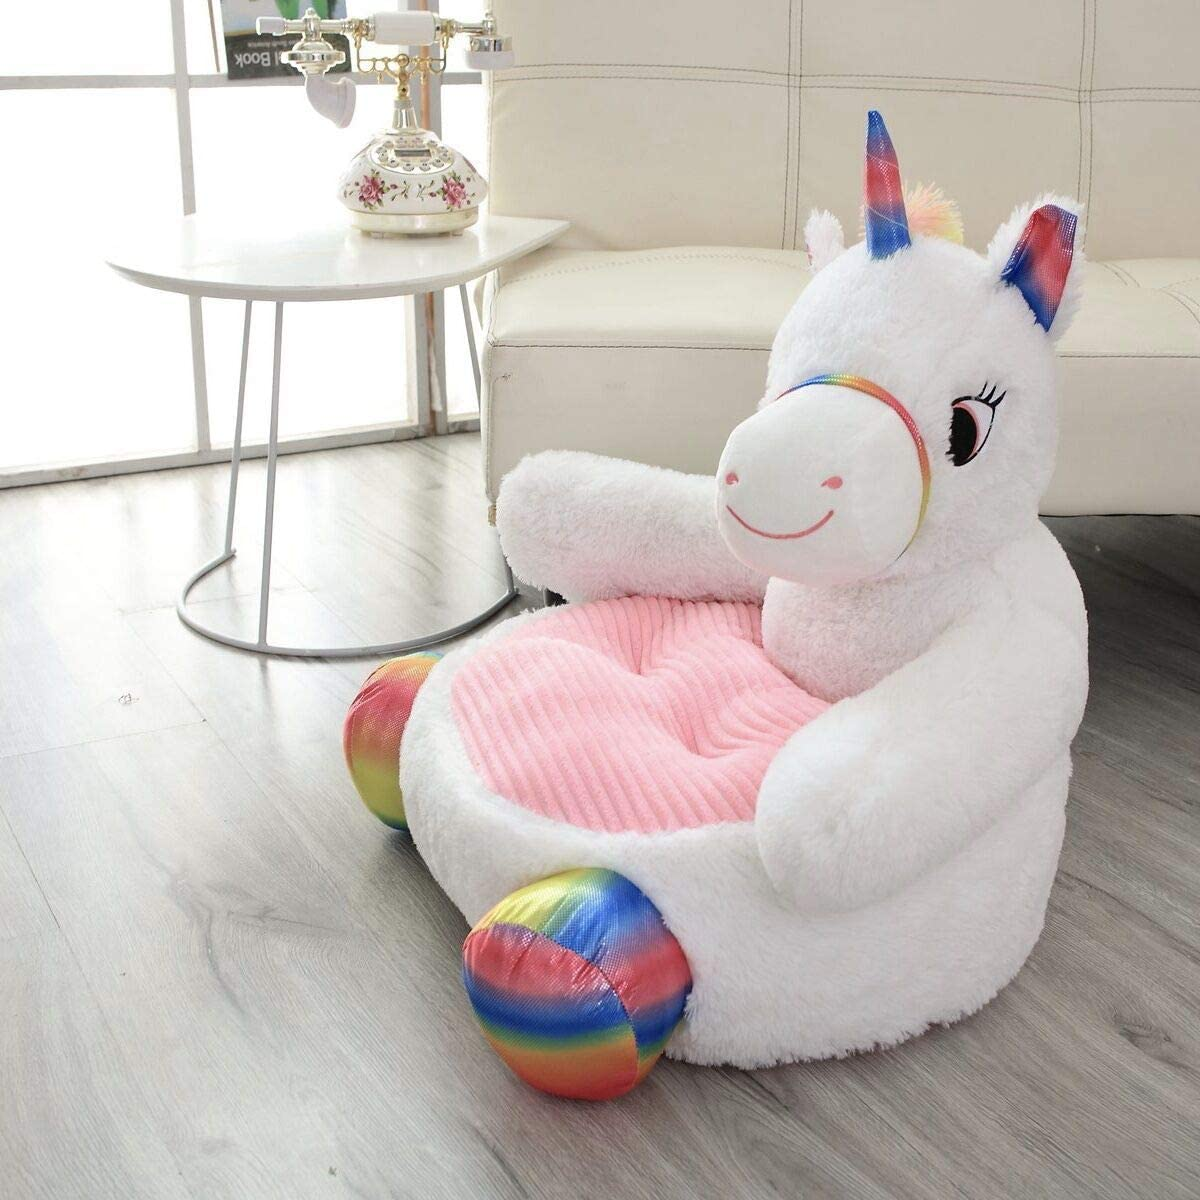 MJTP Poltrona per Bambini Grey Elephant Seat Sofa Chair Baby Snuggle Sofa Peluche Camera da Letto Playroom